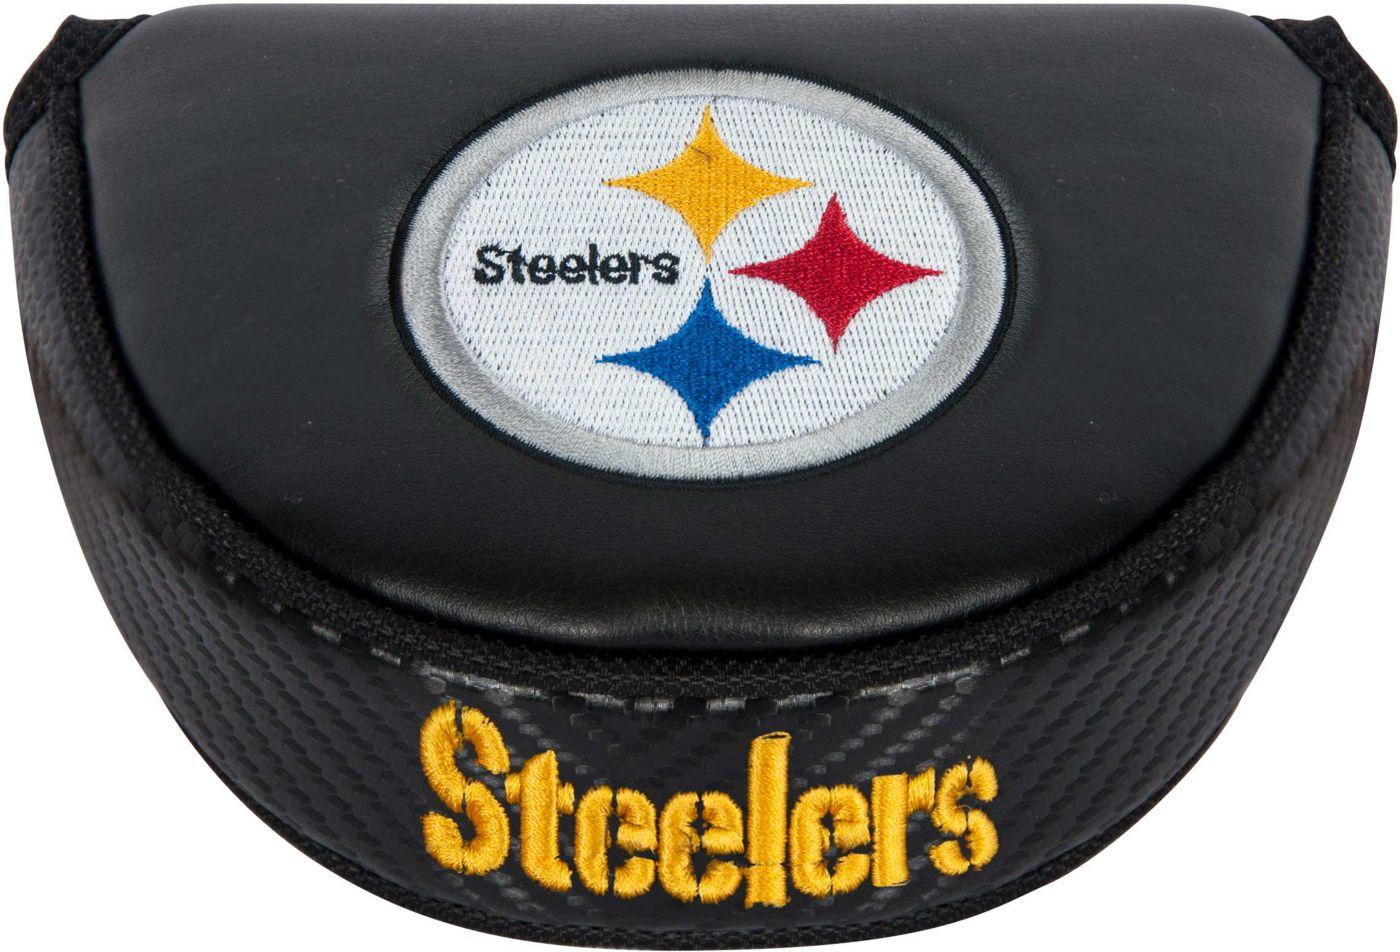 Team Effort Pittsburgh Steelers Mallet Putter Headcover